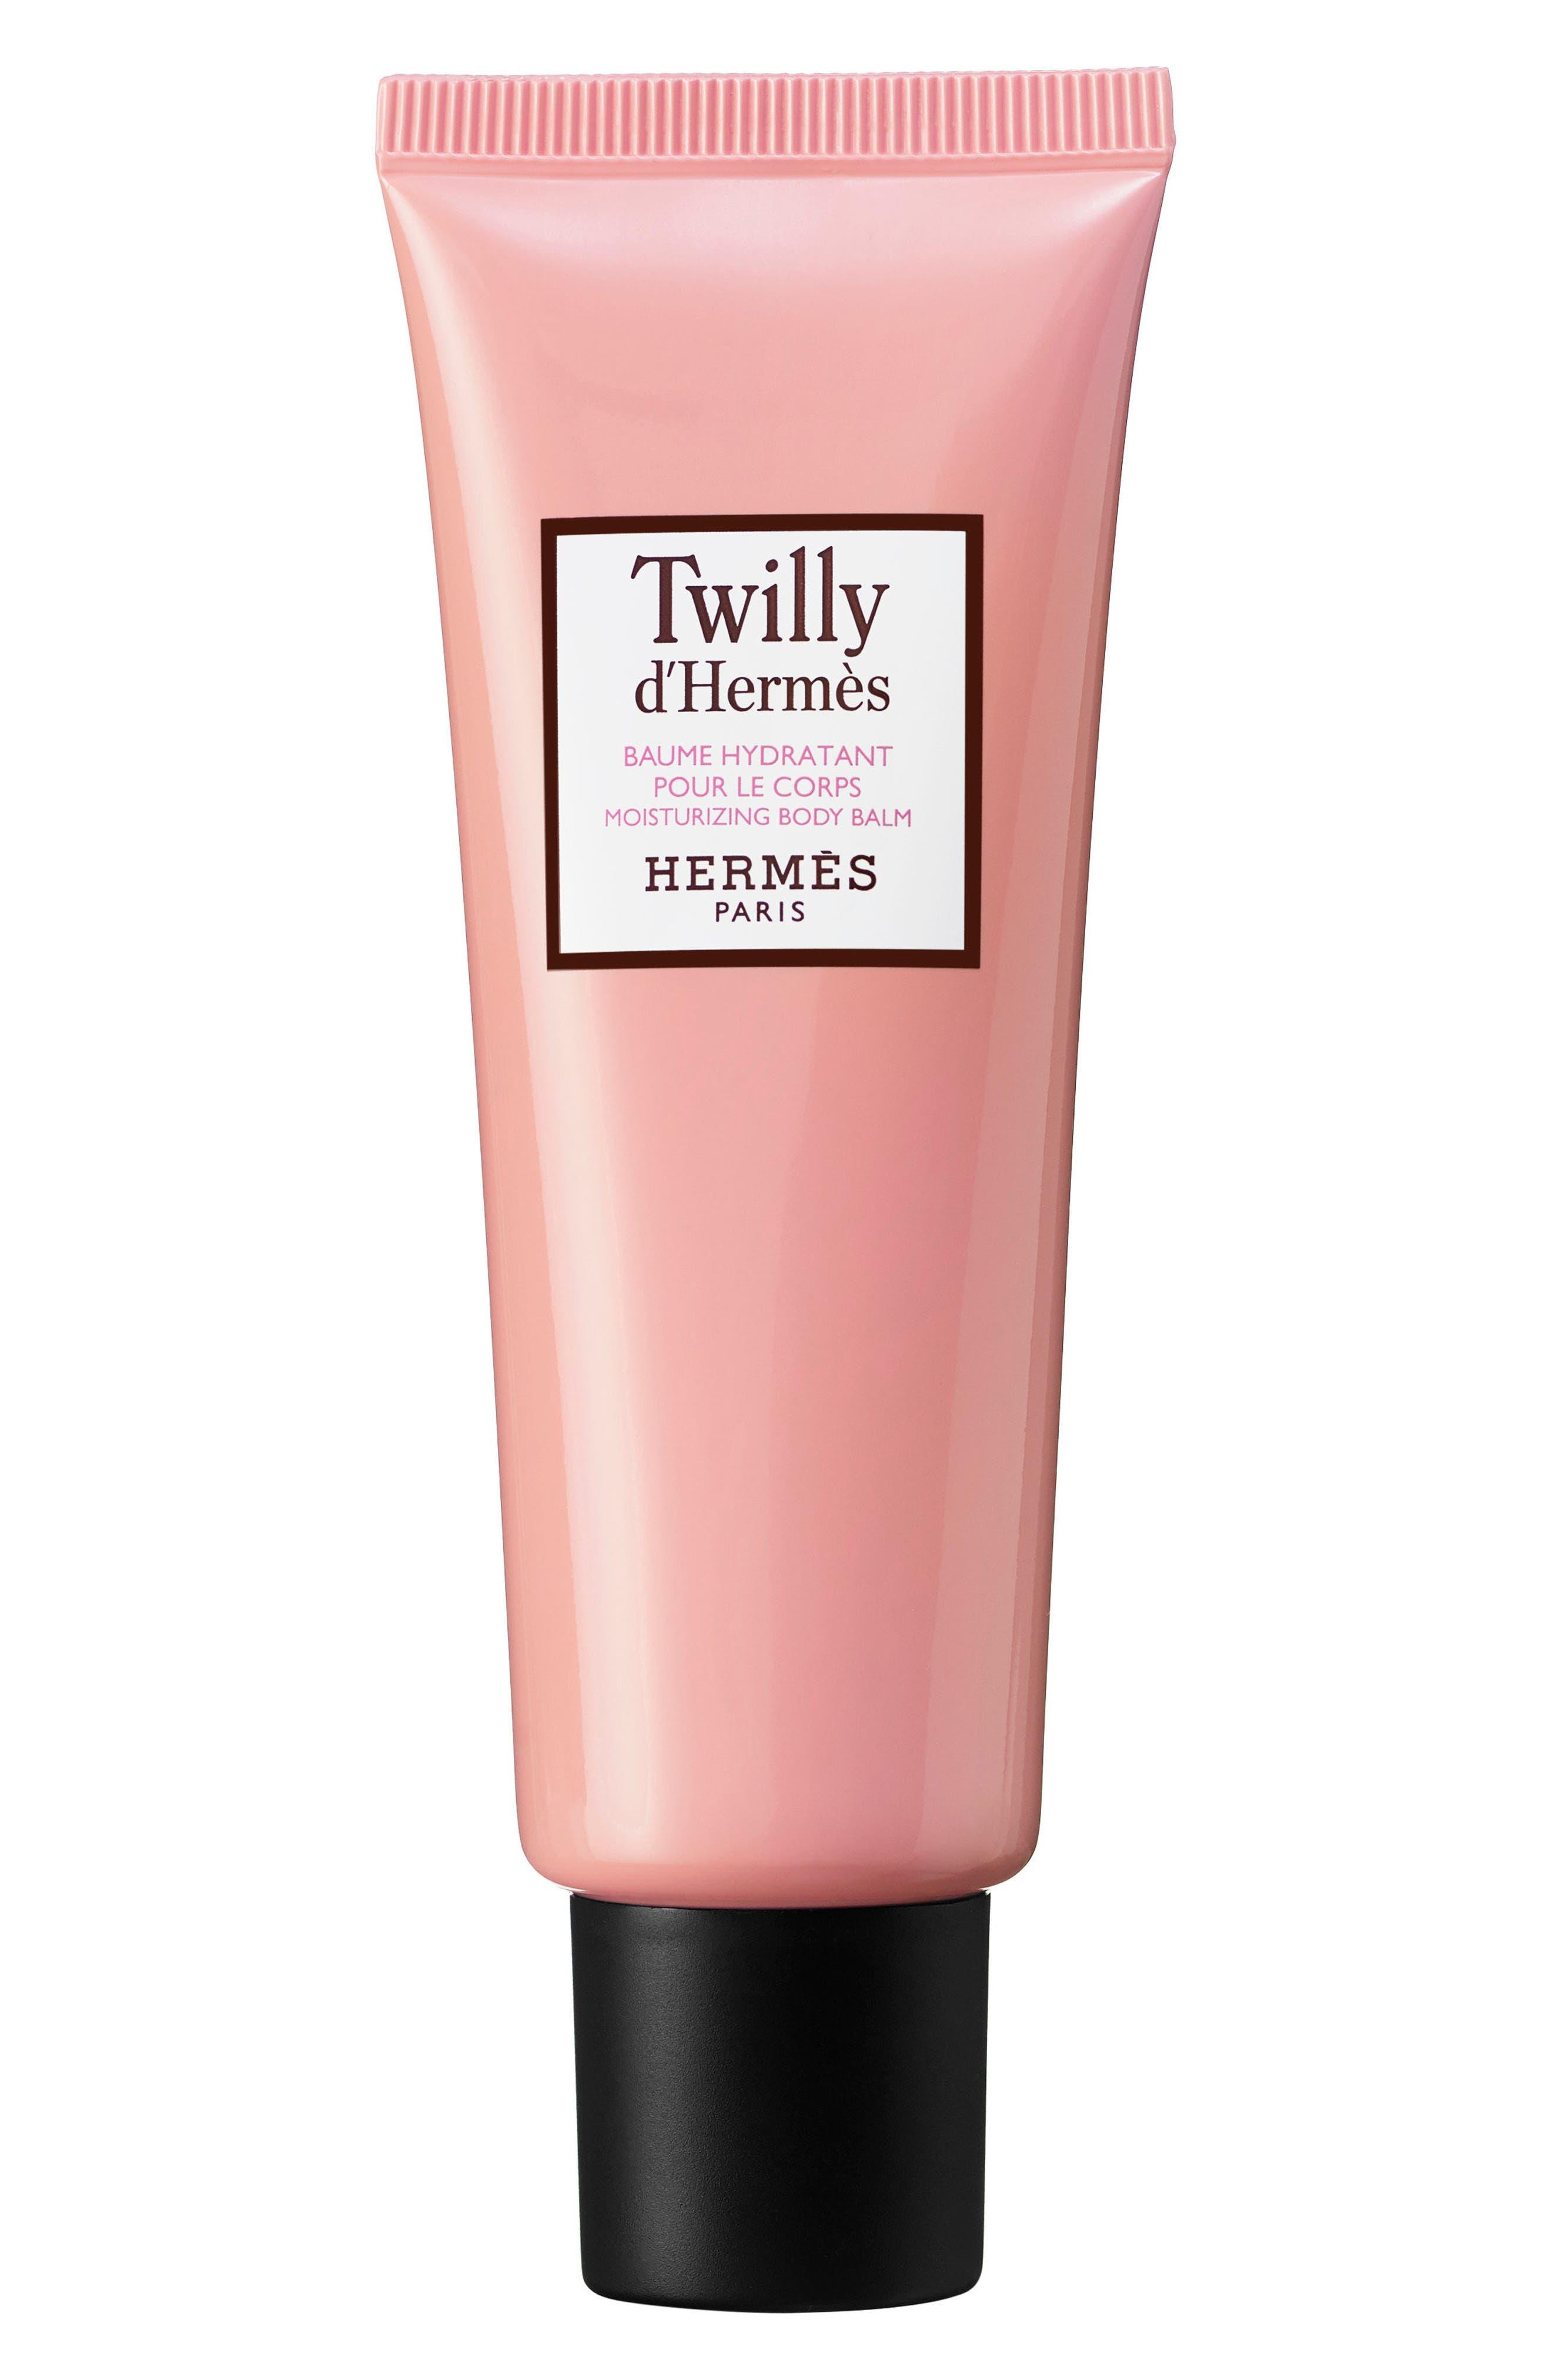 Twilly d'Hermès - Moisturizing body balm,                             Main thumbnail 1, color,                             No Color